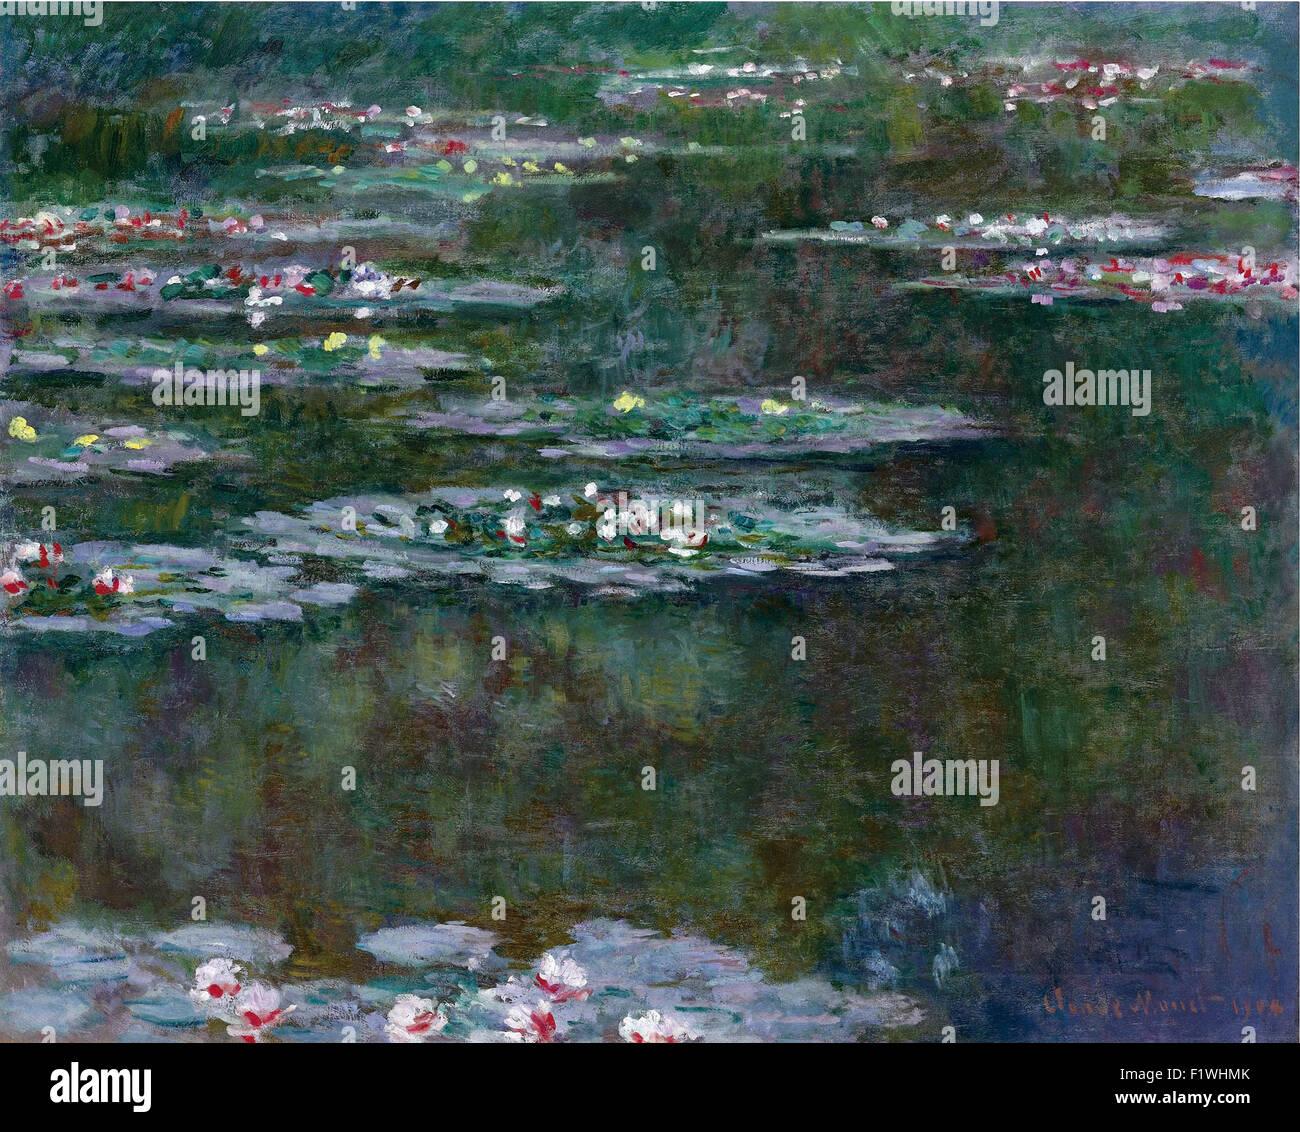 Claude Monet - Nymphéas 12 - Stock Image